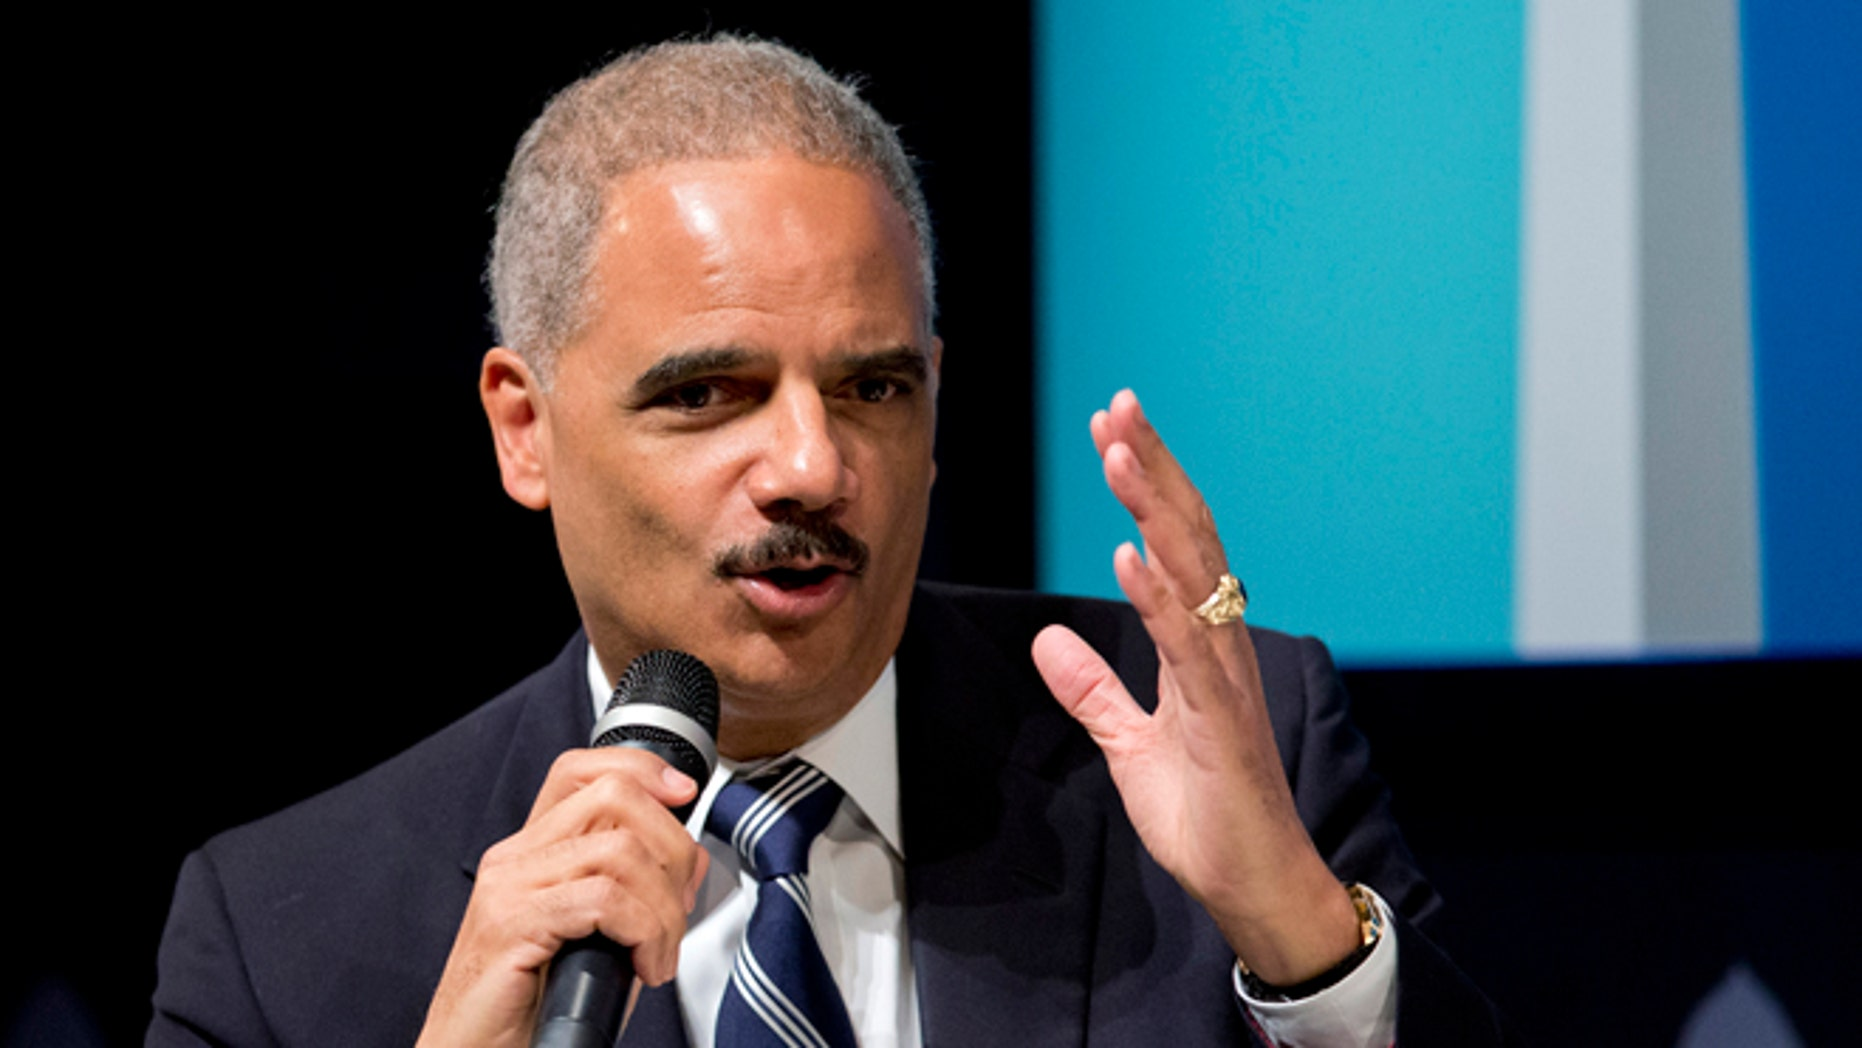 Oct. 29, 2014: Attorney General Eric Holder speaks at the 'Washington Ideas Forum' in Washington.